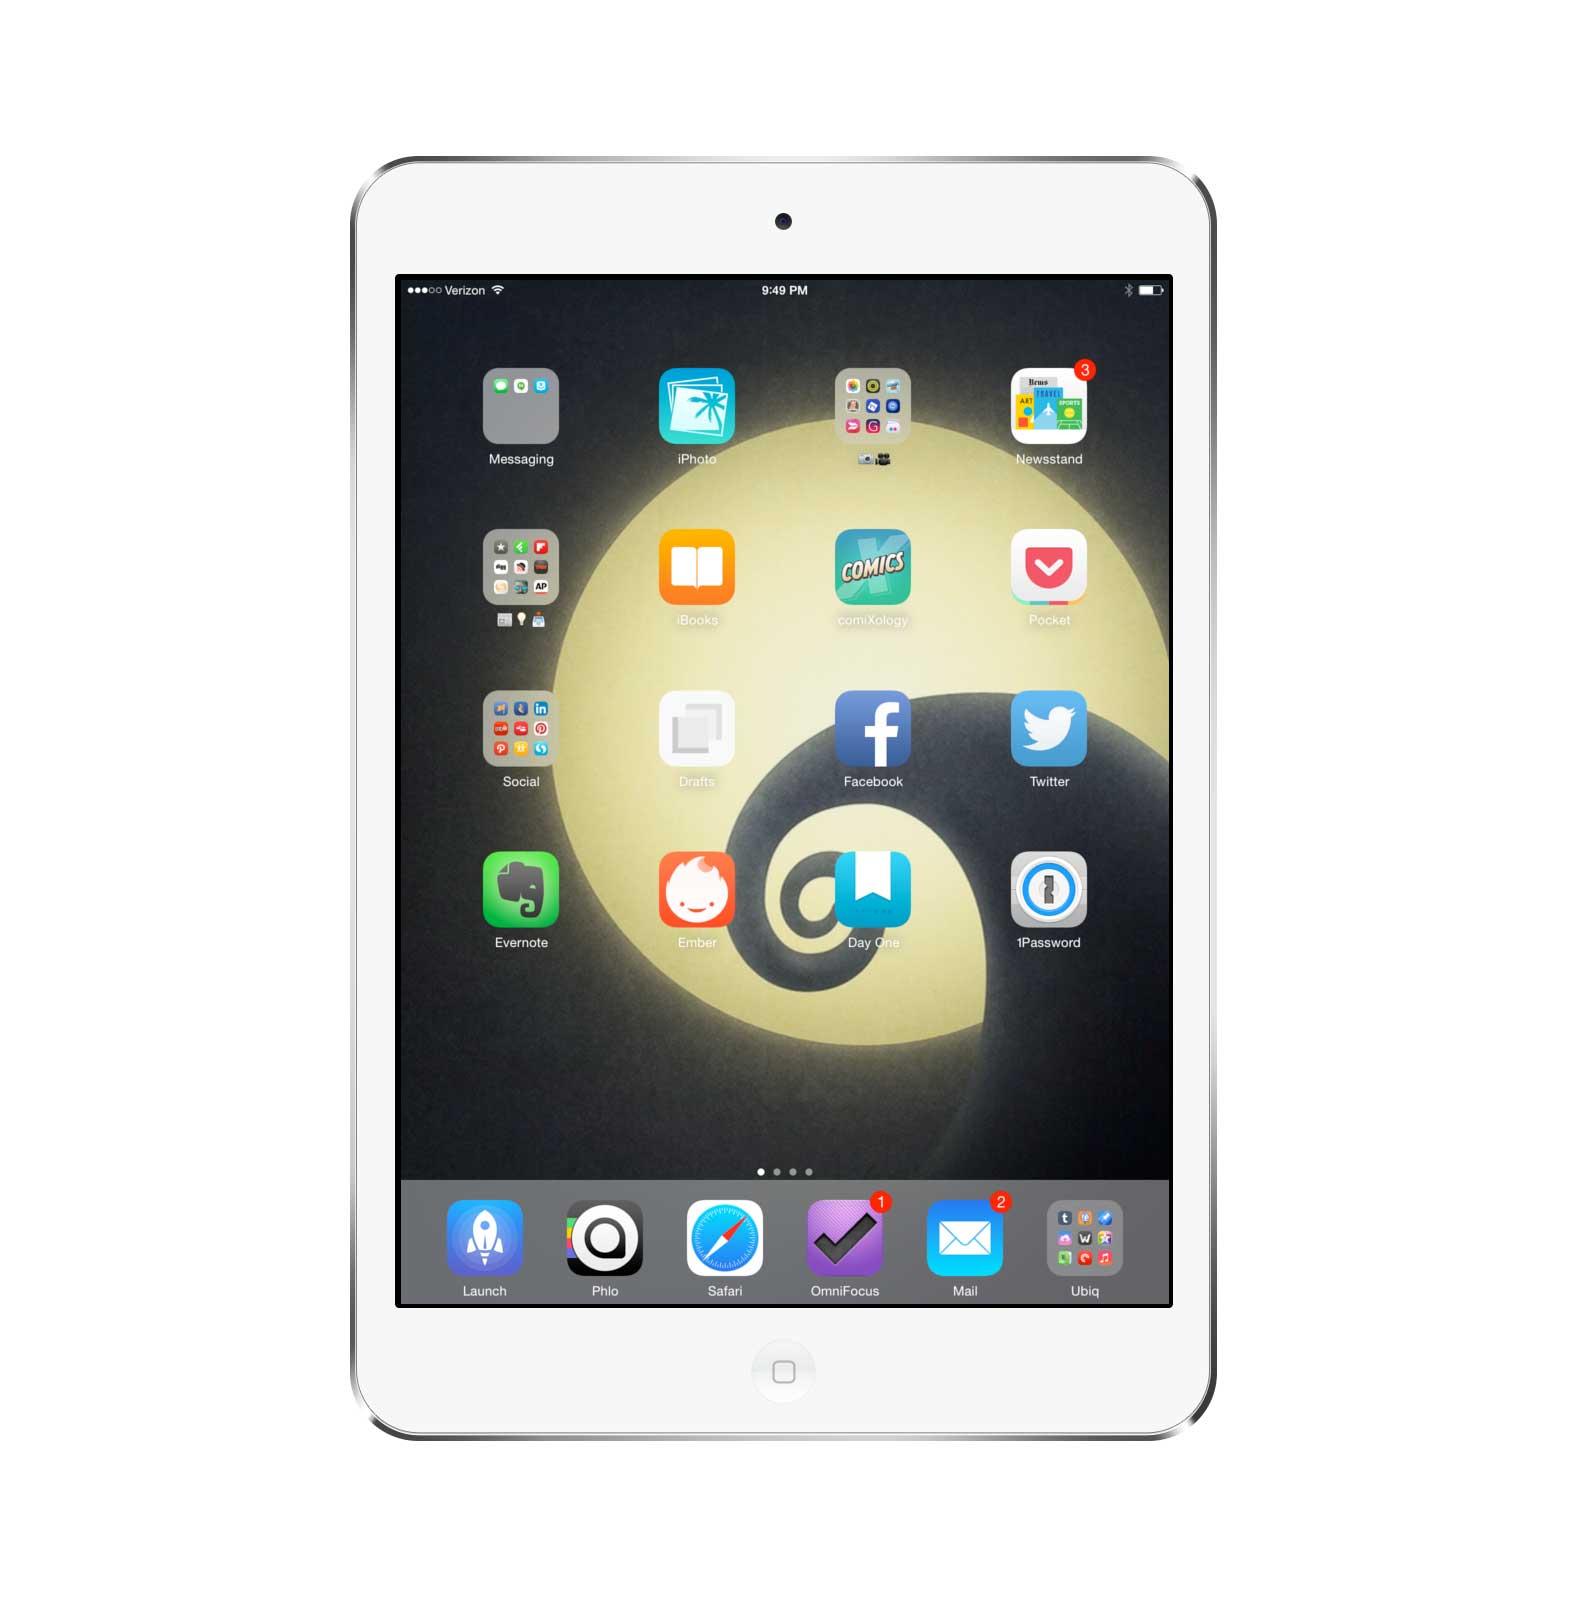 David Chartier's iPad